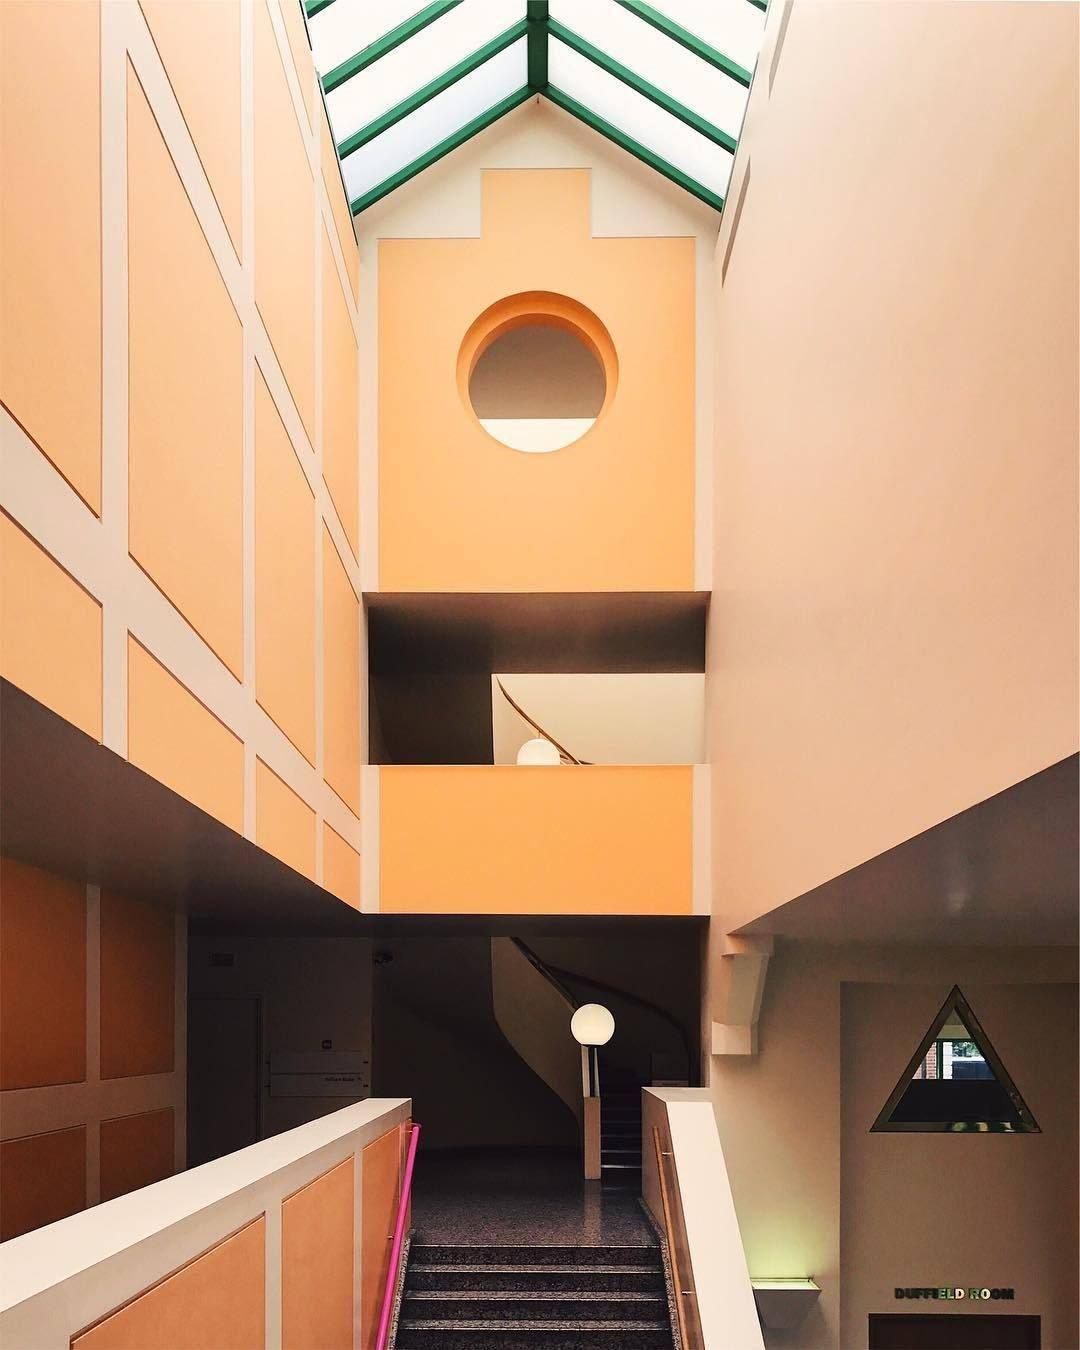 1987 Clore Gallery at Tate Britain